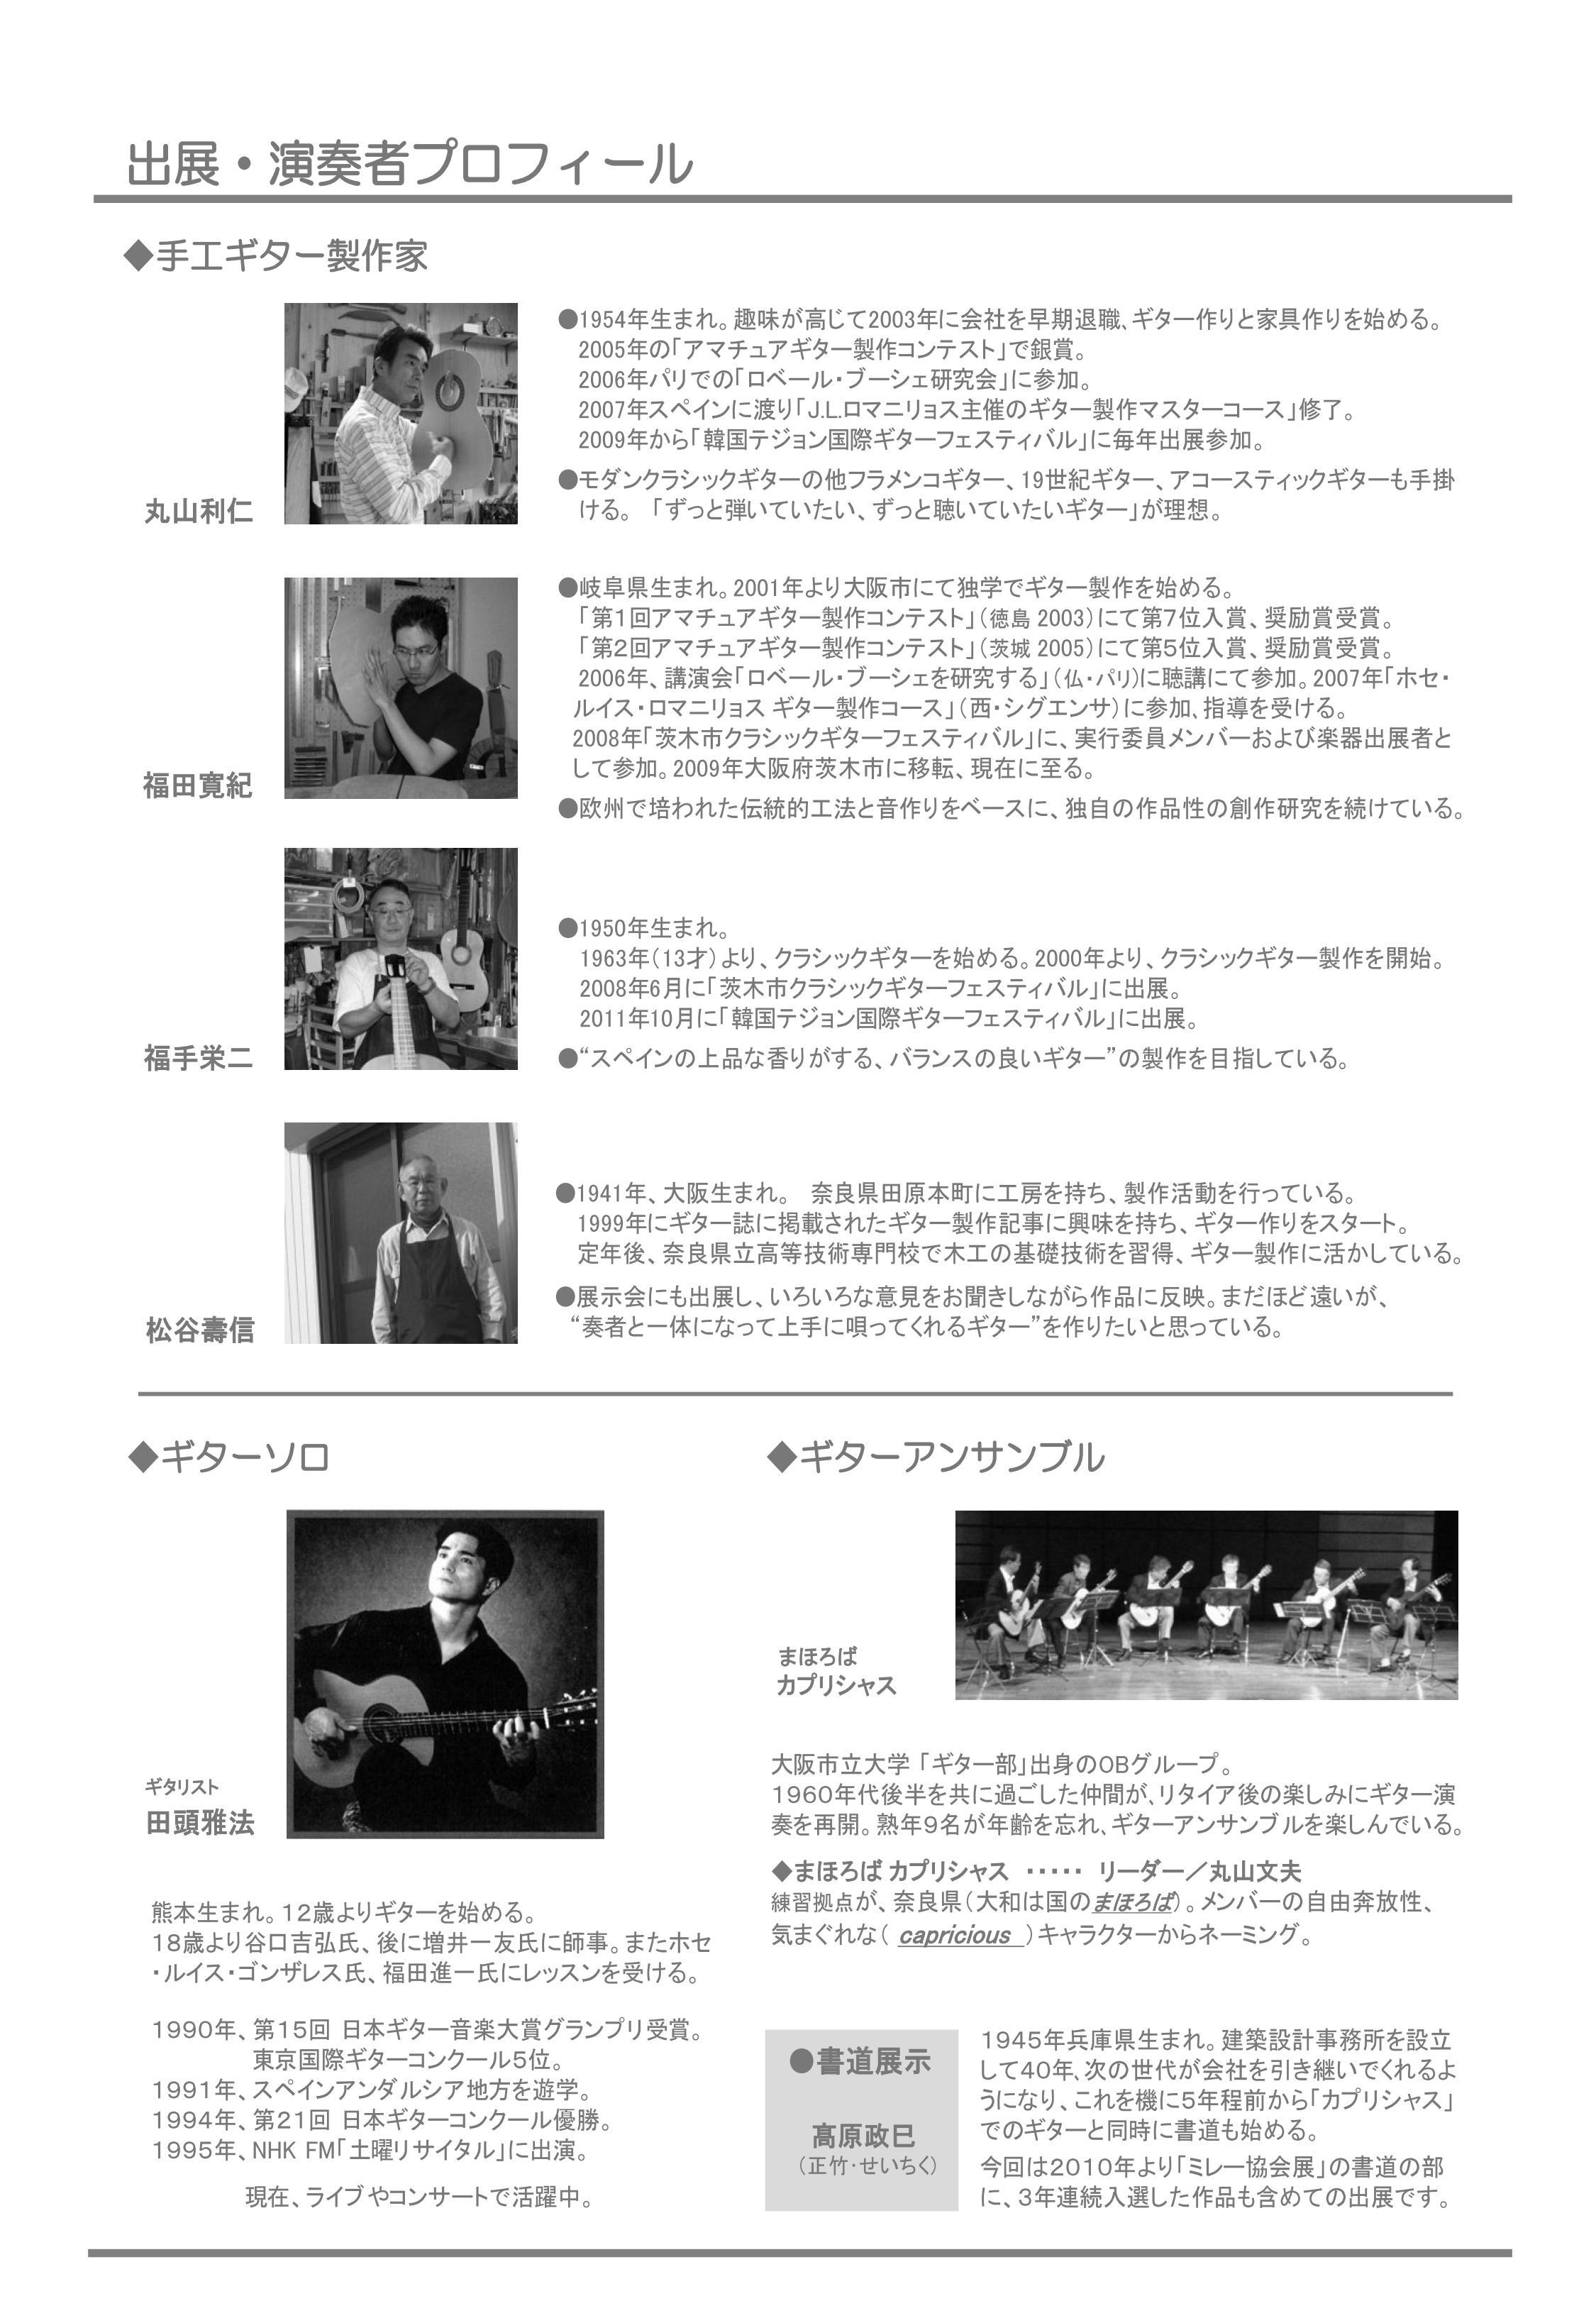 GuitarFesta_ATC.jpg